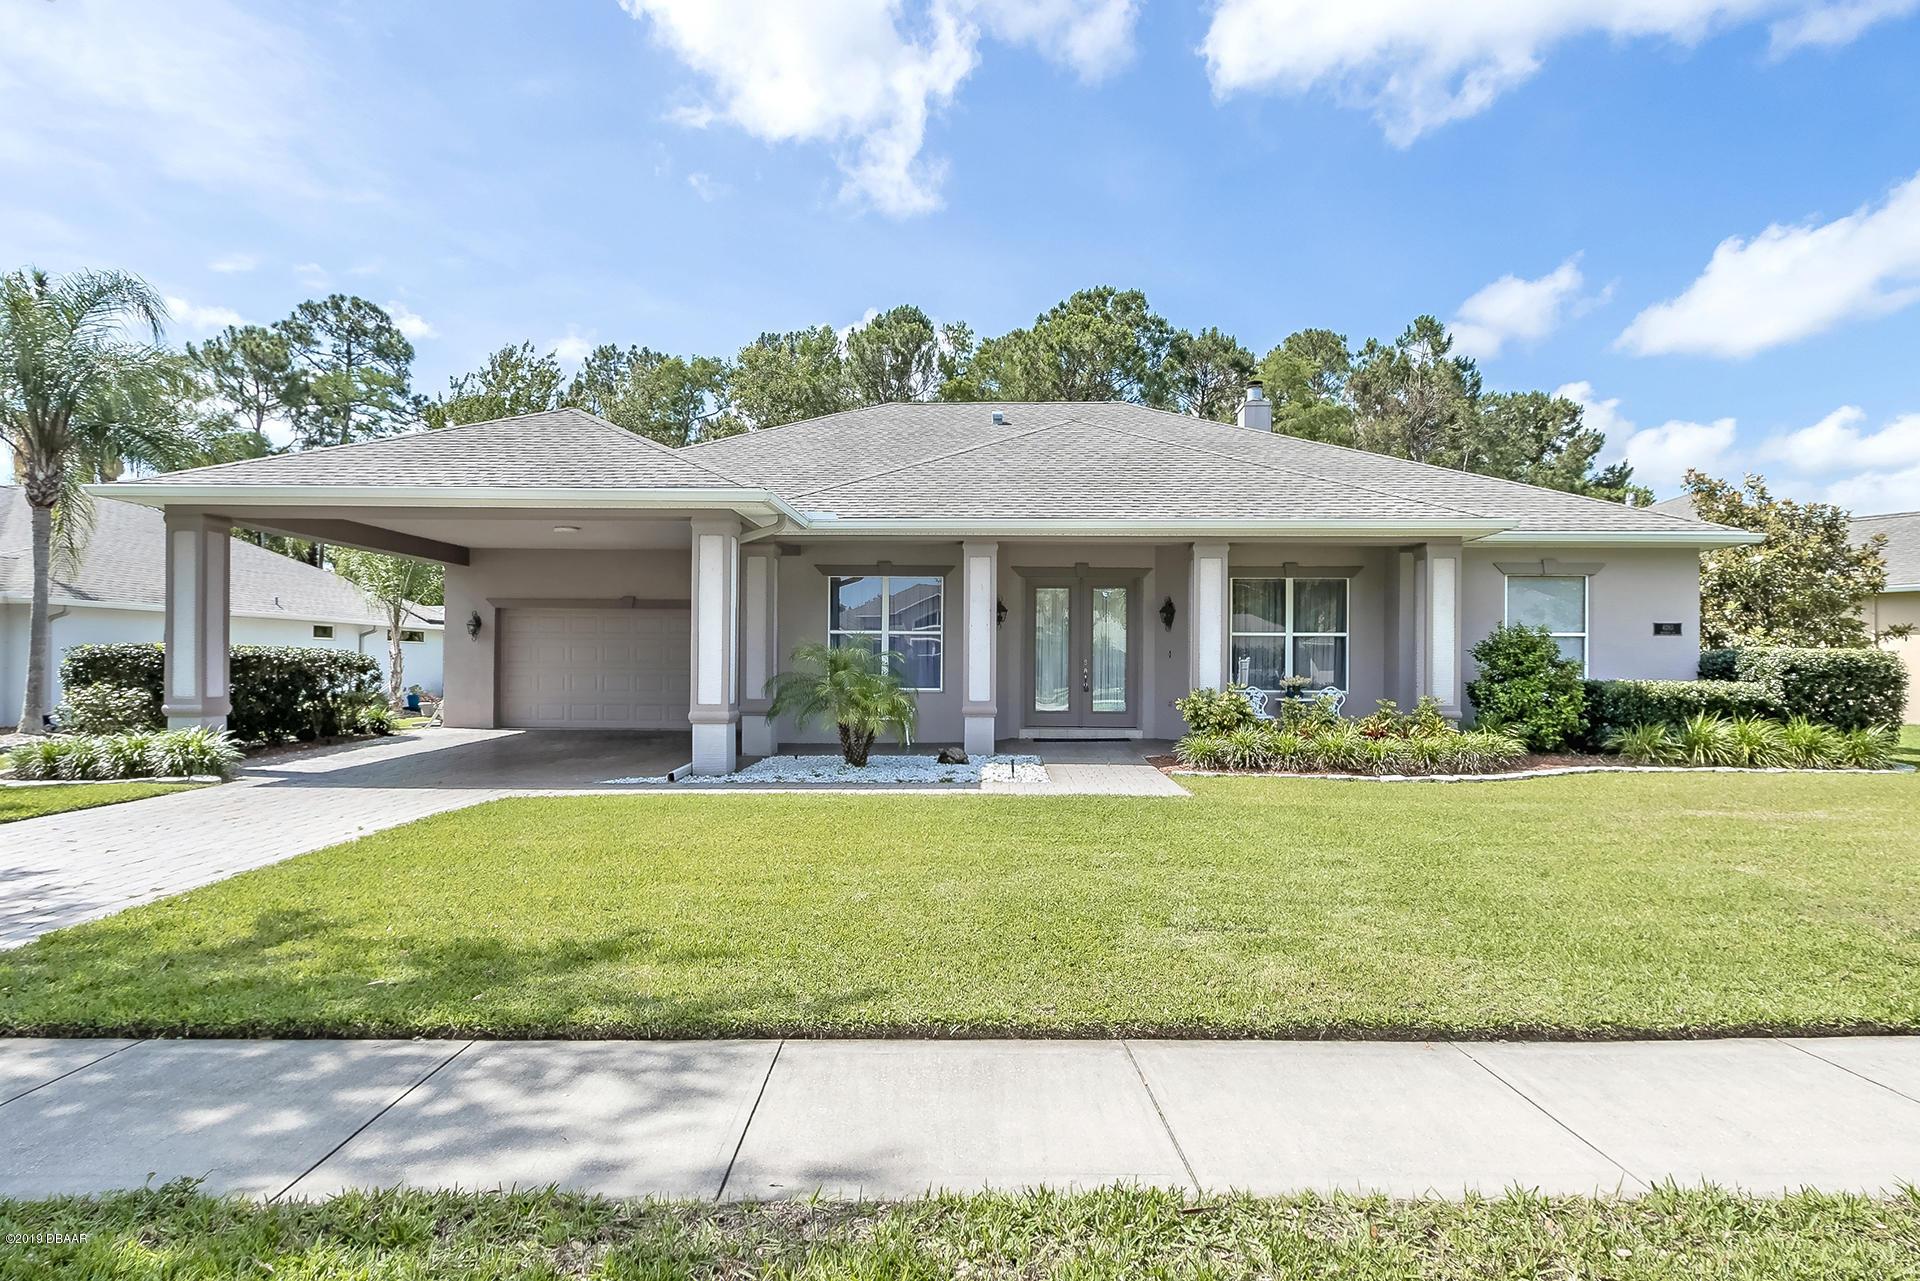 Photo of 4283 Mayfair Lane, Port Orange, FL 32129